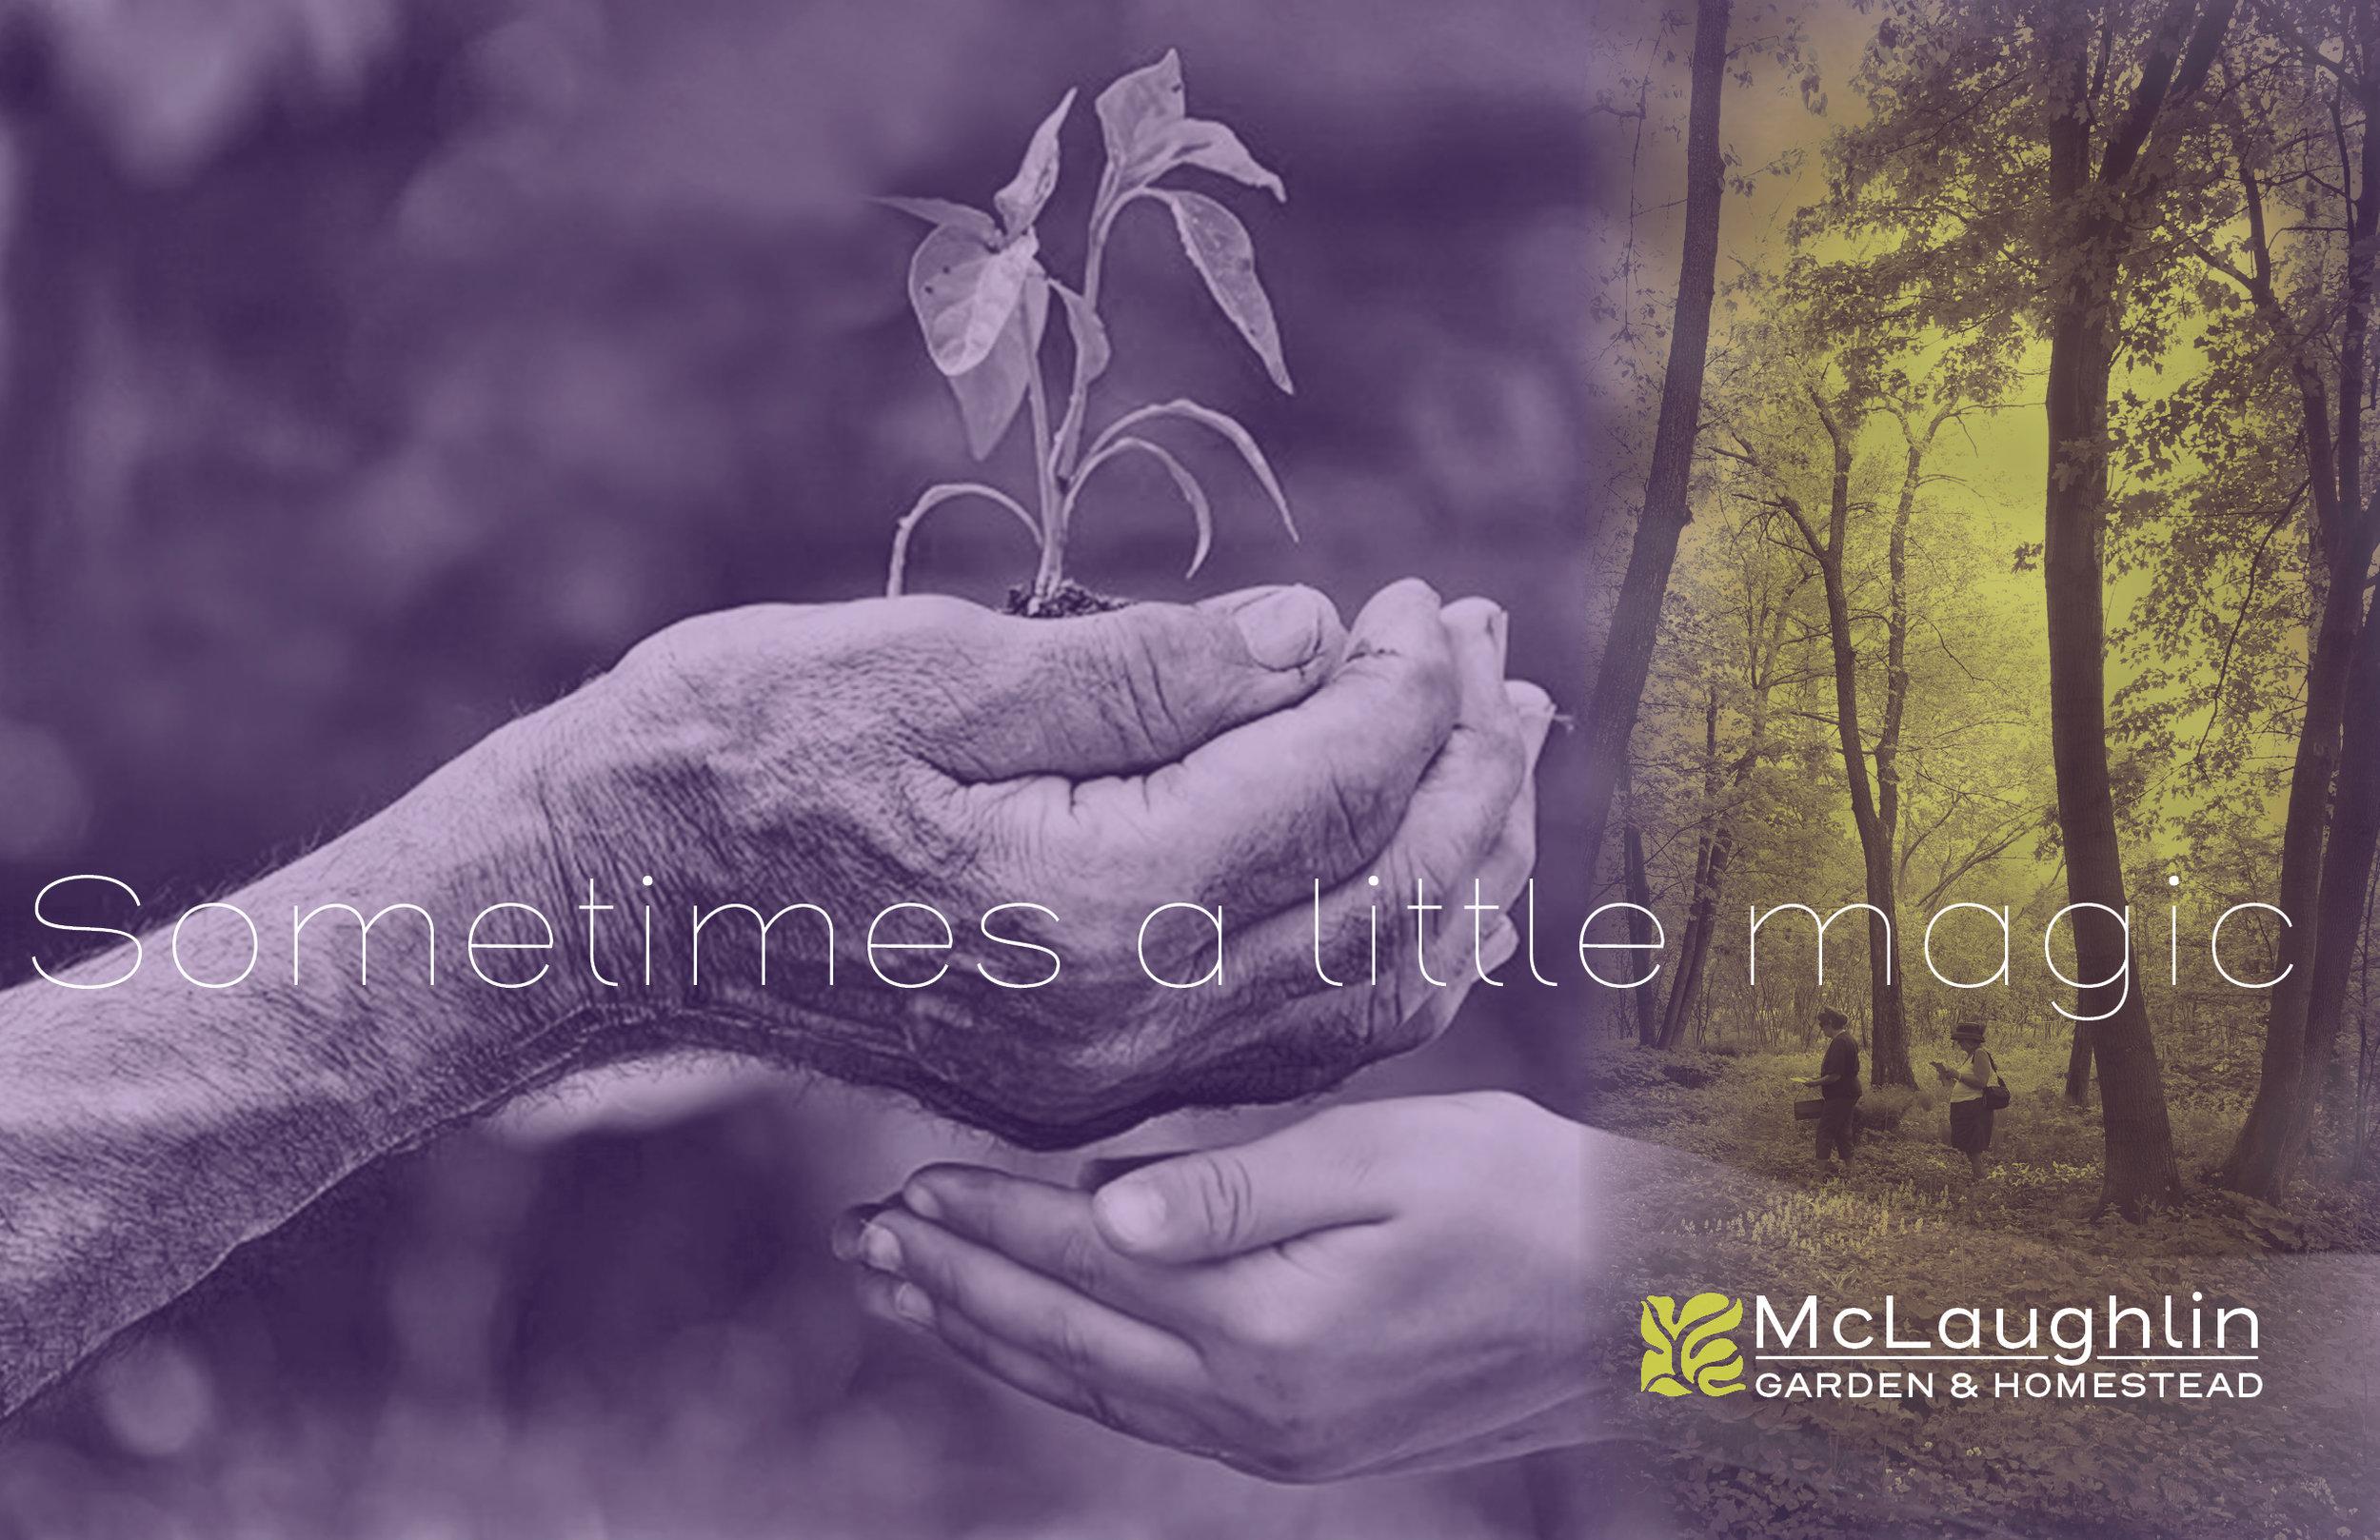 Logo and brochure cover for McLaughlin Garden & Homestead   South Paris, Maine